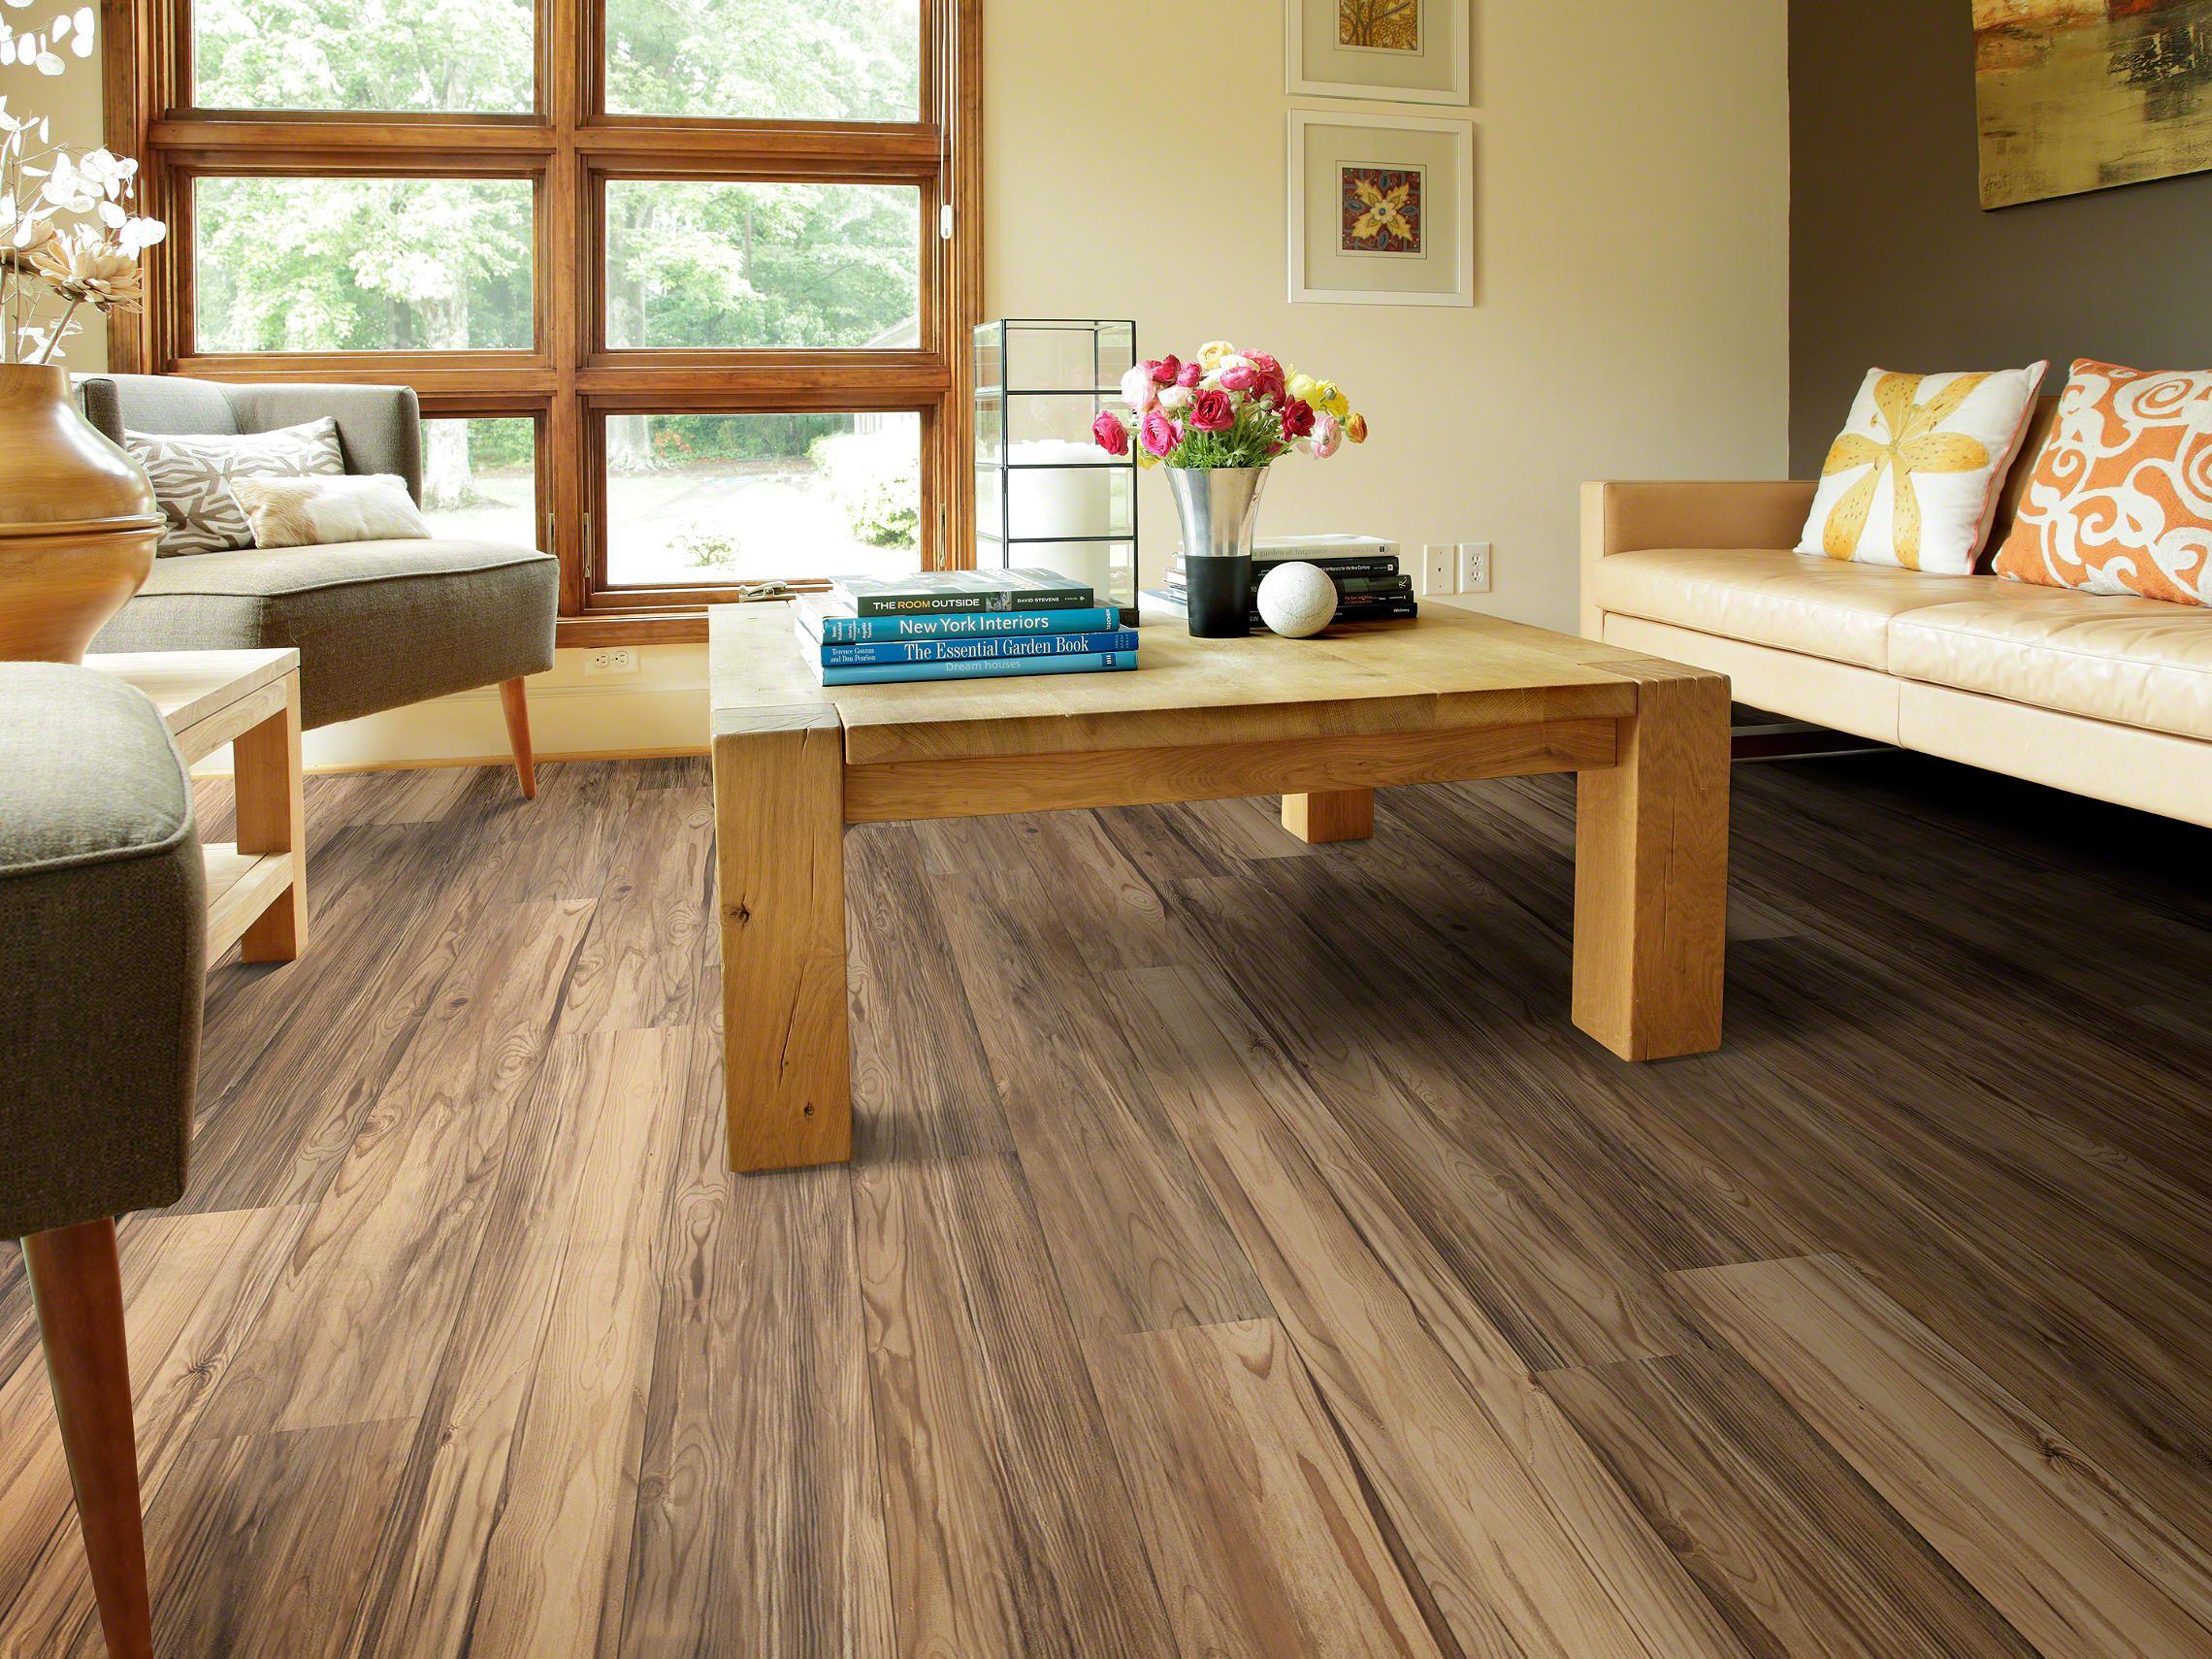 LARGO PLANK CAPLONE Room View Vinyl flooring, Luxury